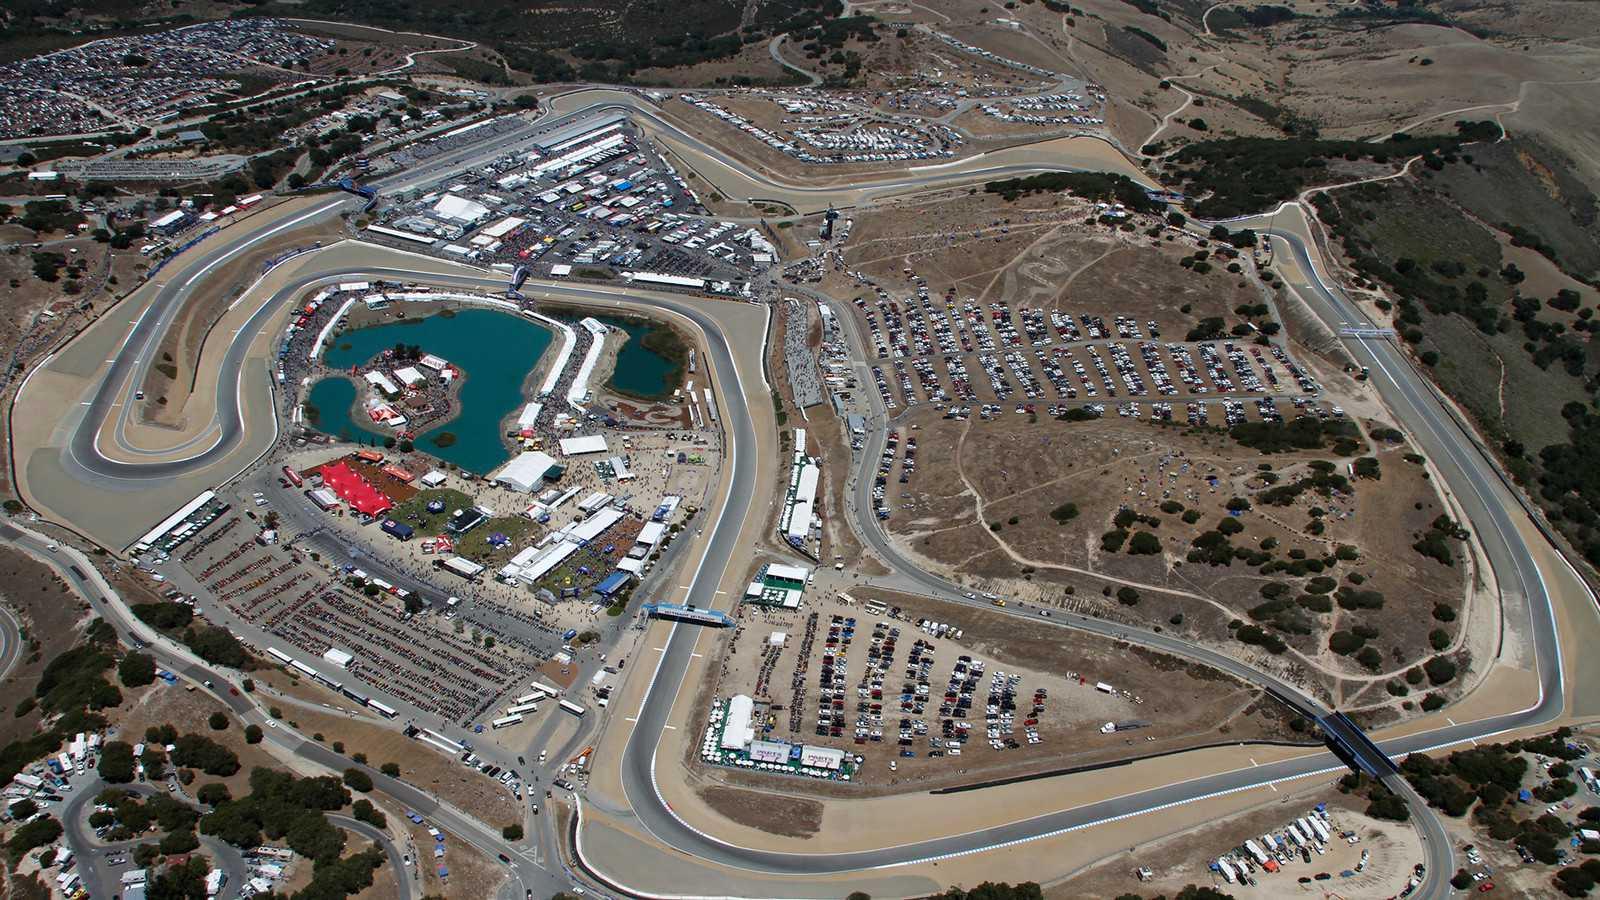 Mazda Raceway Laguna Seca >> Mazda Raceway Laguna Seca Will Be Managed By Scramp For At